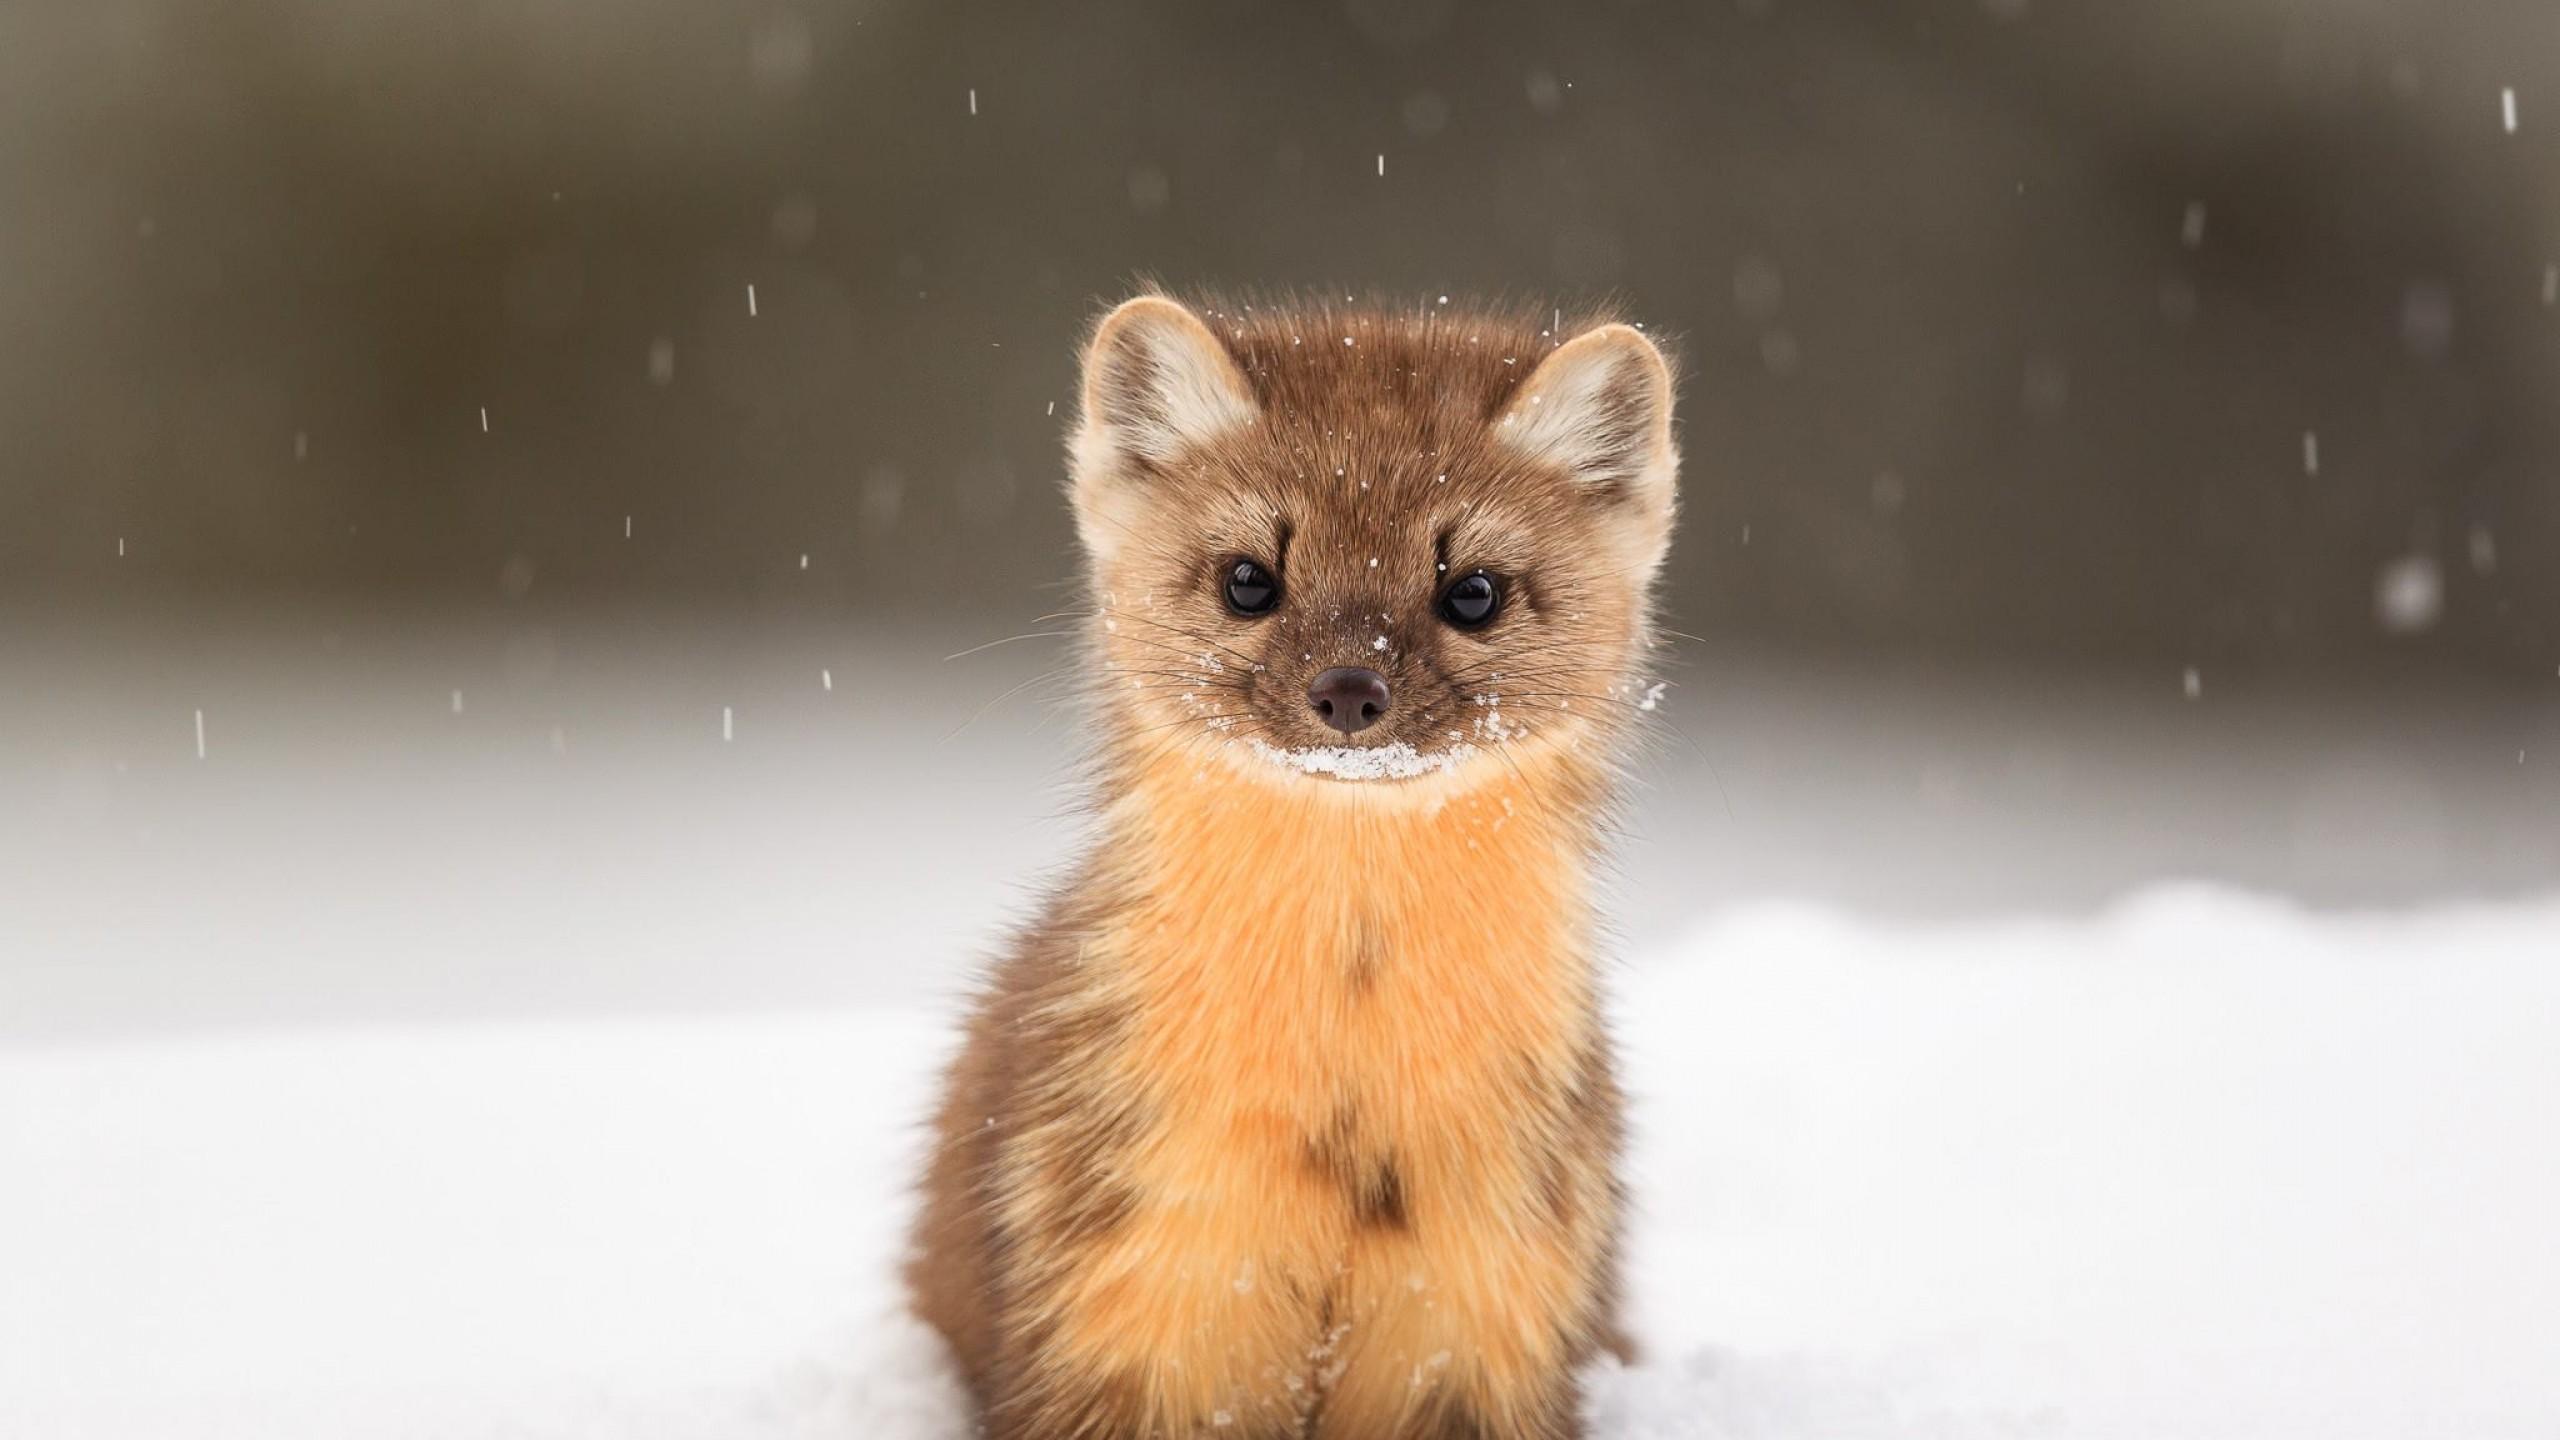 Into The Wild Quotes Wallpaper Wallpaper American Marten Snow Cute Animals Hd Animals